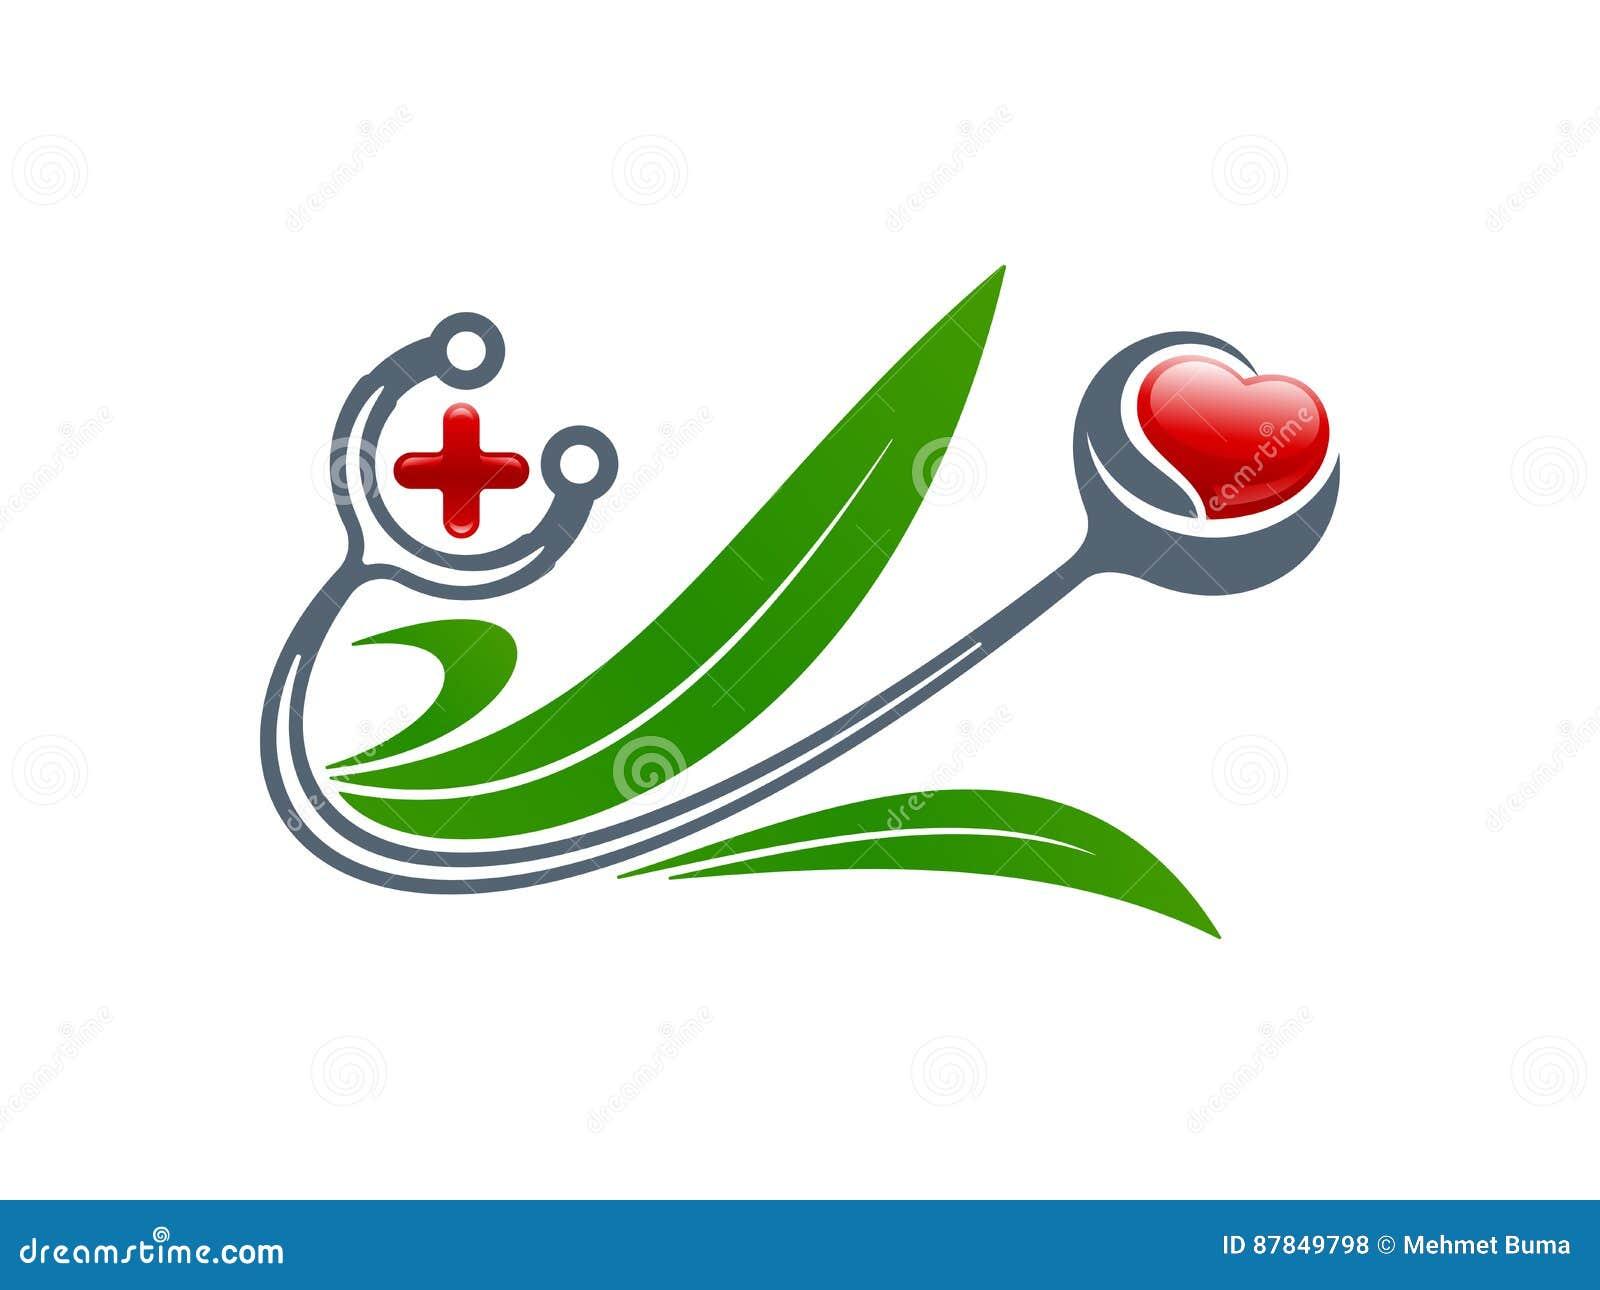 Medical concept stethoscope heart cross leaves symbols vect stethoscope heart cross leaves symbols vect buycottarizona